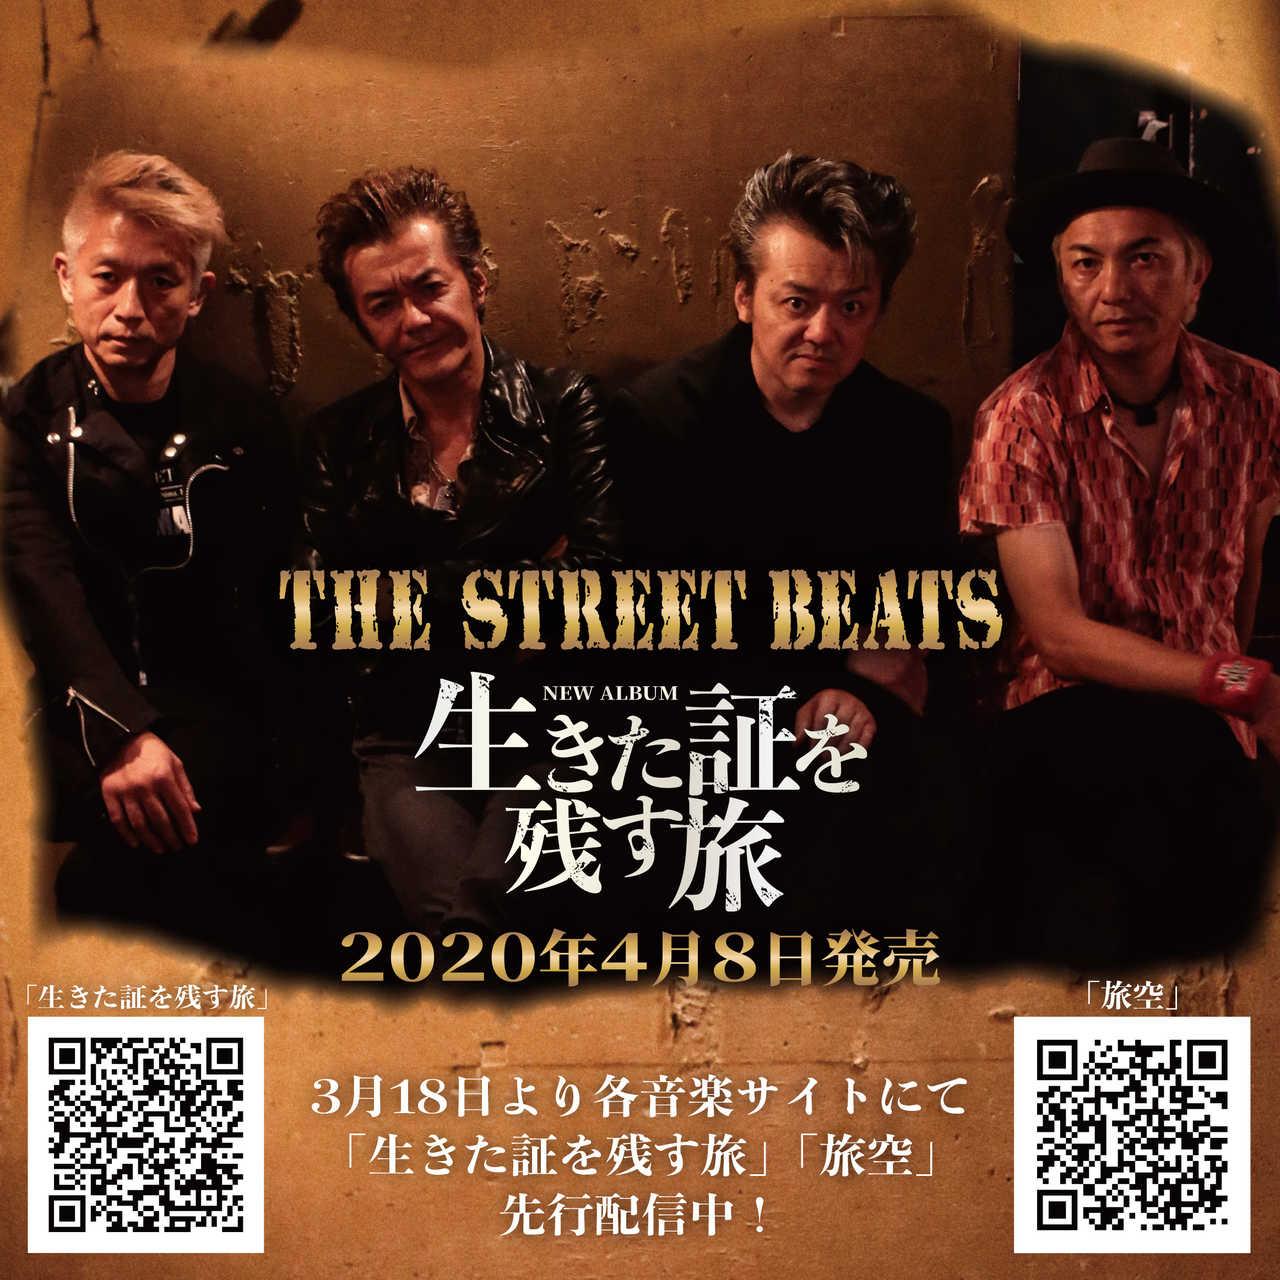 THE STREET BEATS、ニューアルバムより2曲を先行配信